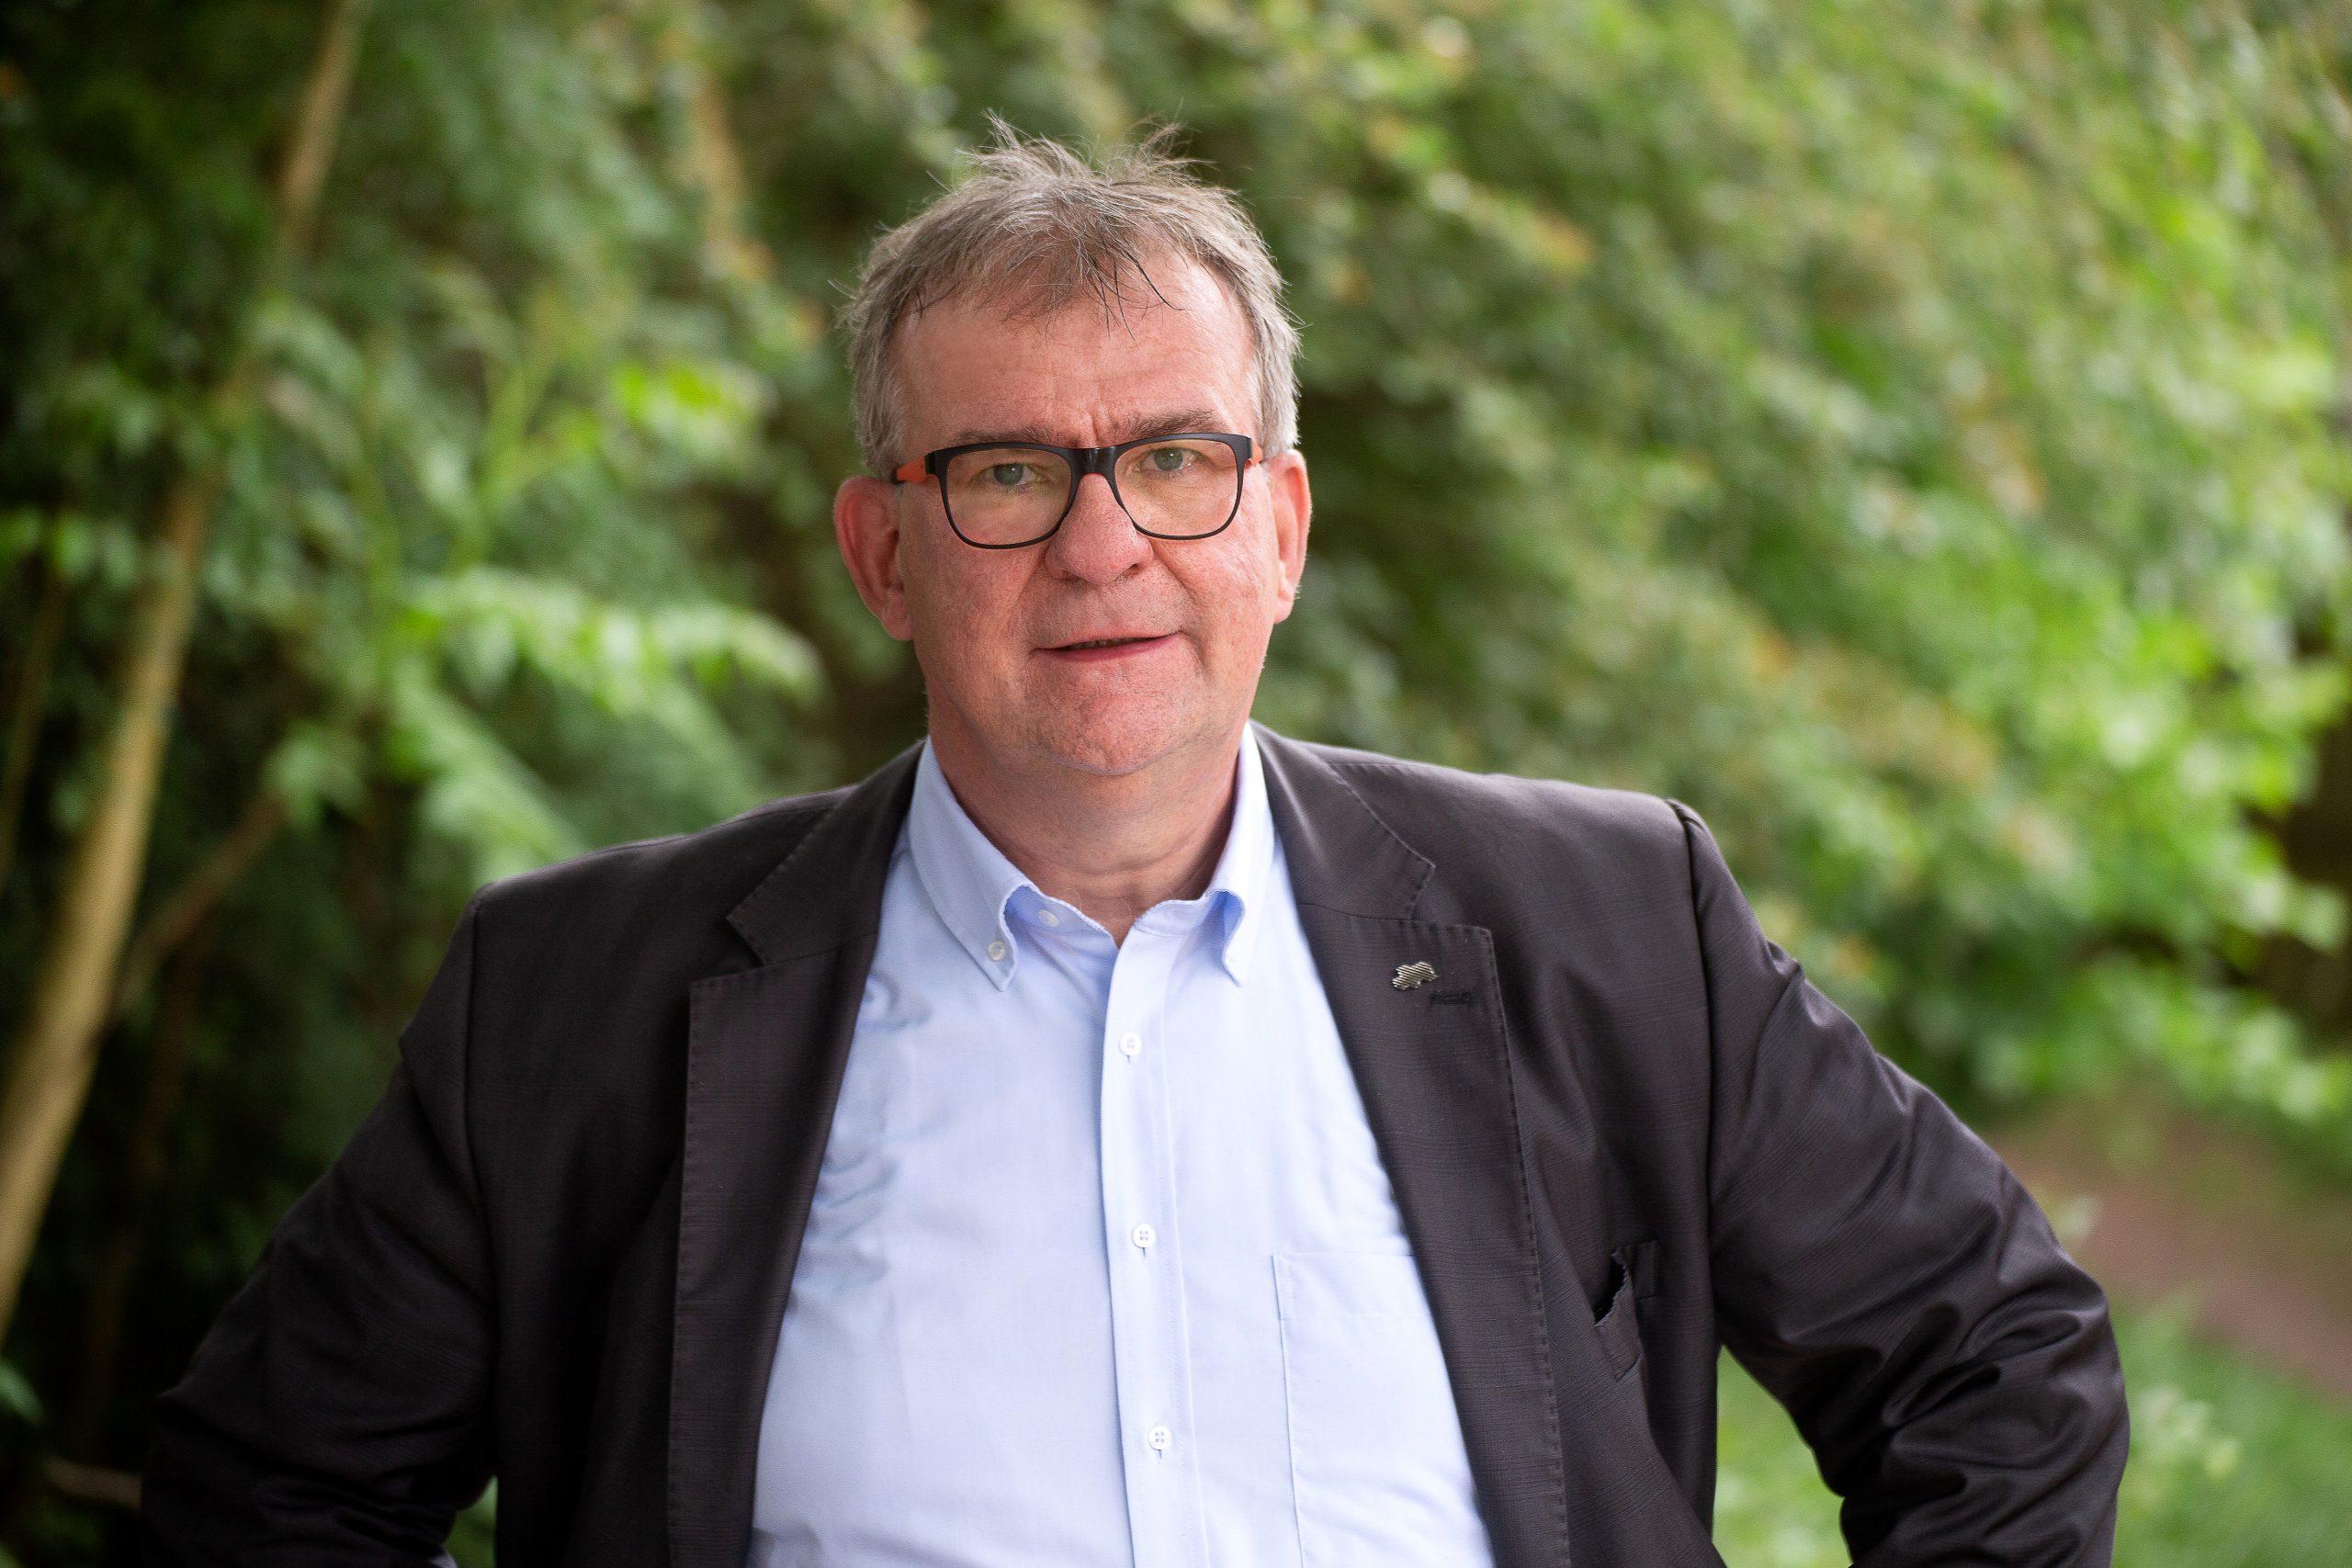 Jens Hebebrand